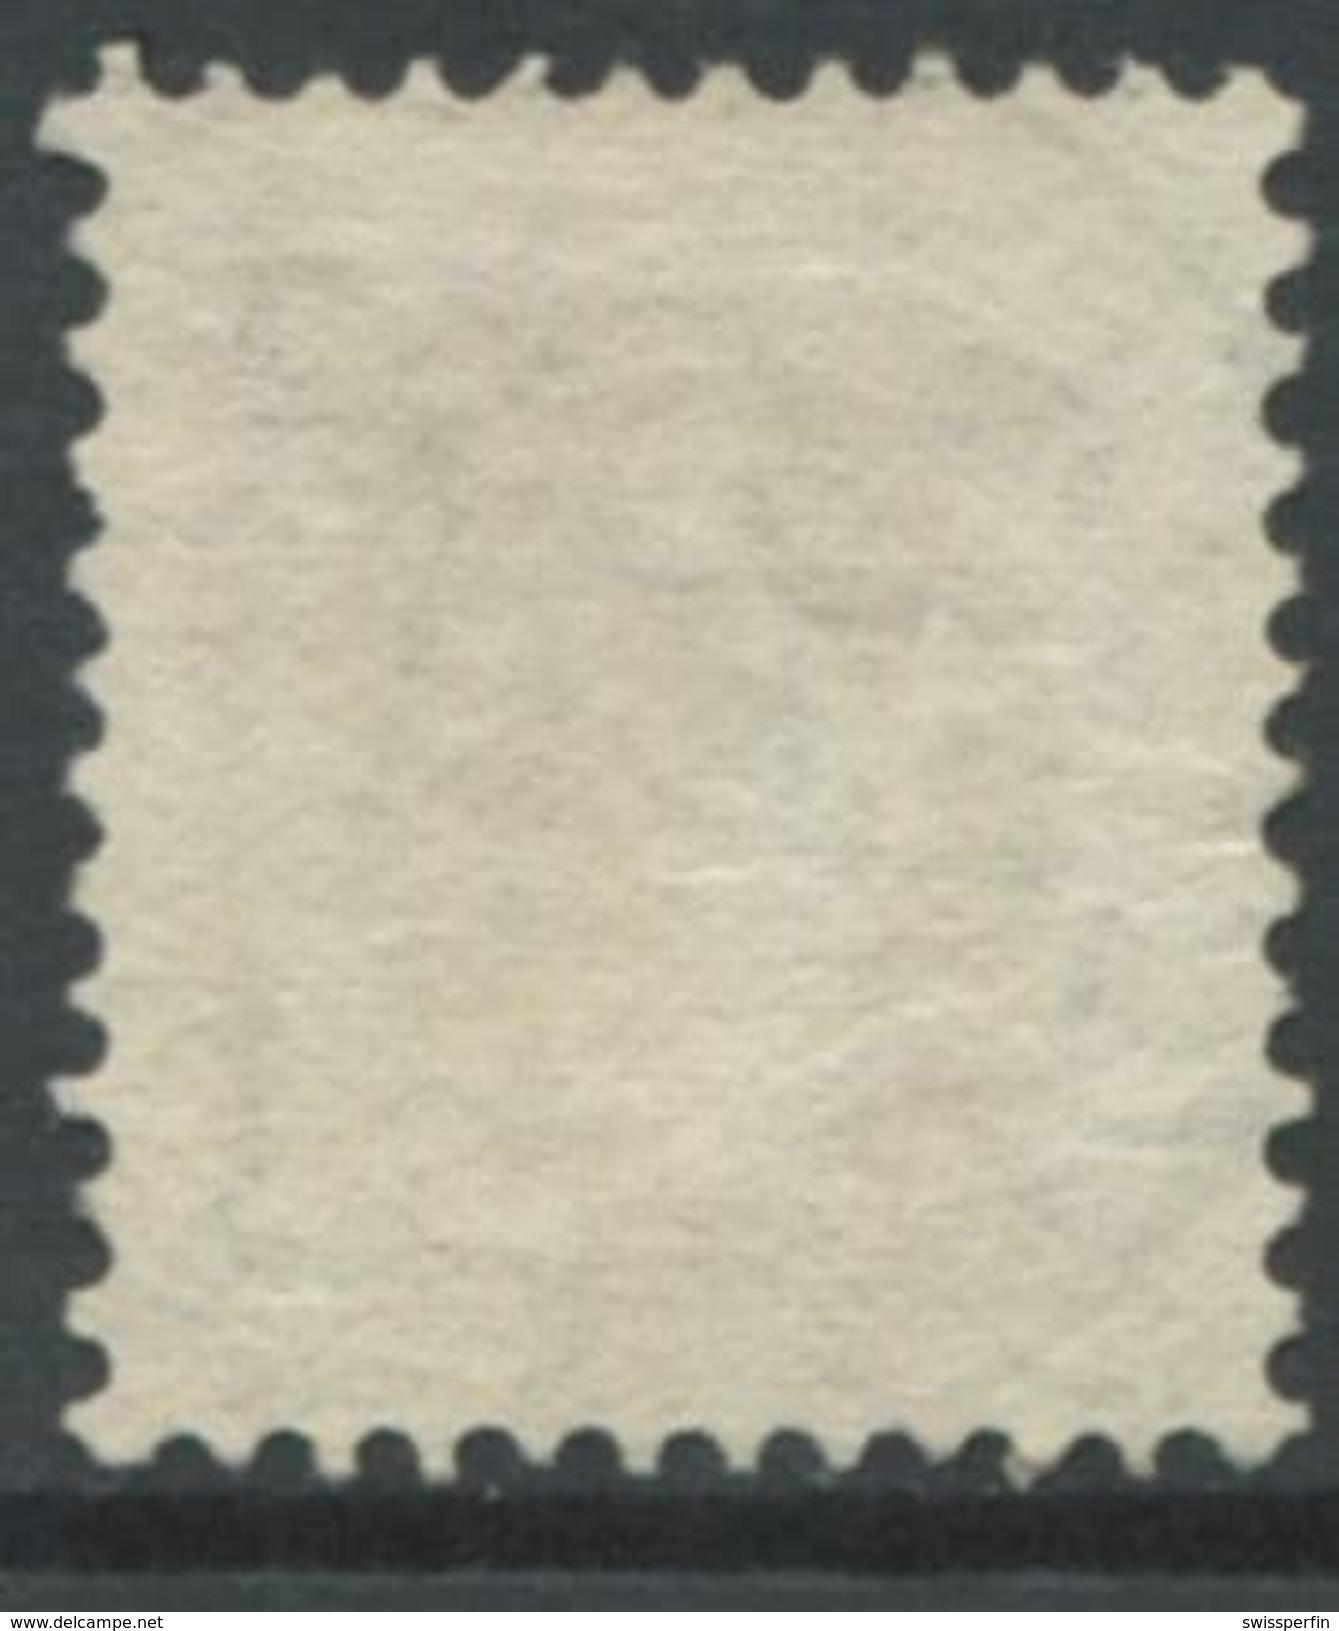 1610 -  40 Rp. Stehende Helvetia Gestempelt - SBK Katalogwert CHF 300.00 - 1882-1906 Wappen, Stehende Helvetia & UPU